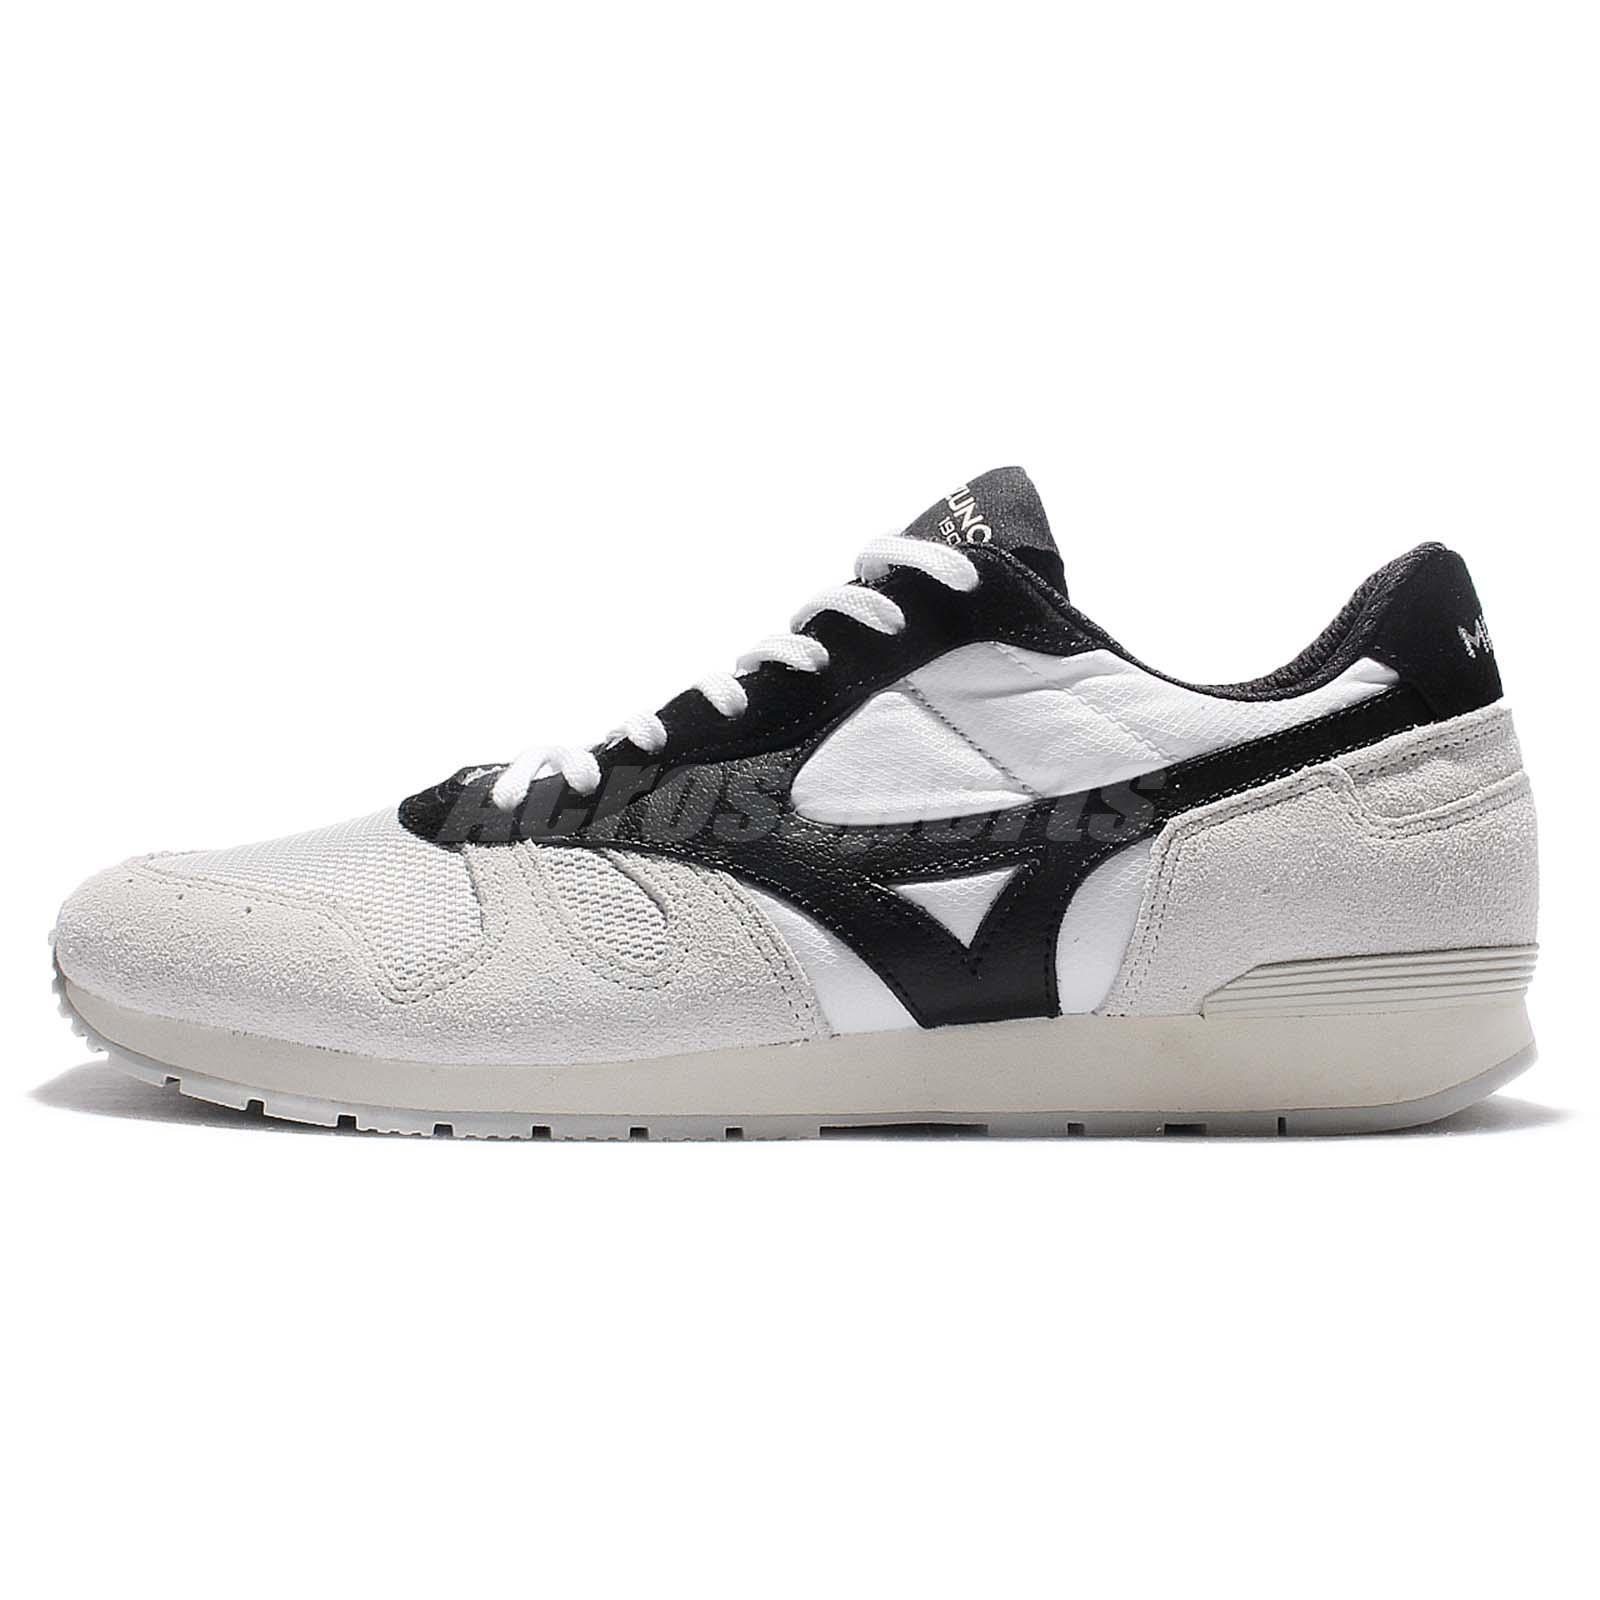 Mizuno Sports Style ML87 Black Beige Men Casual Shoes Sneakers D1GA17-0002 3d48ec6da